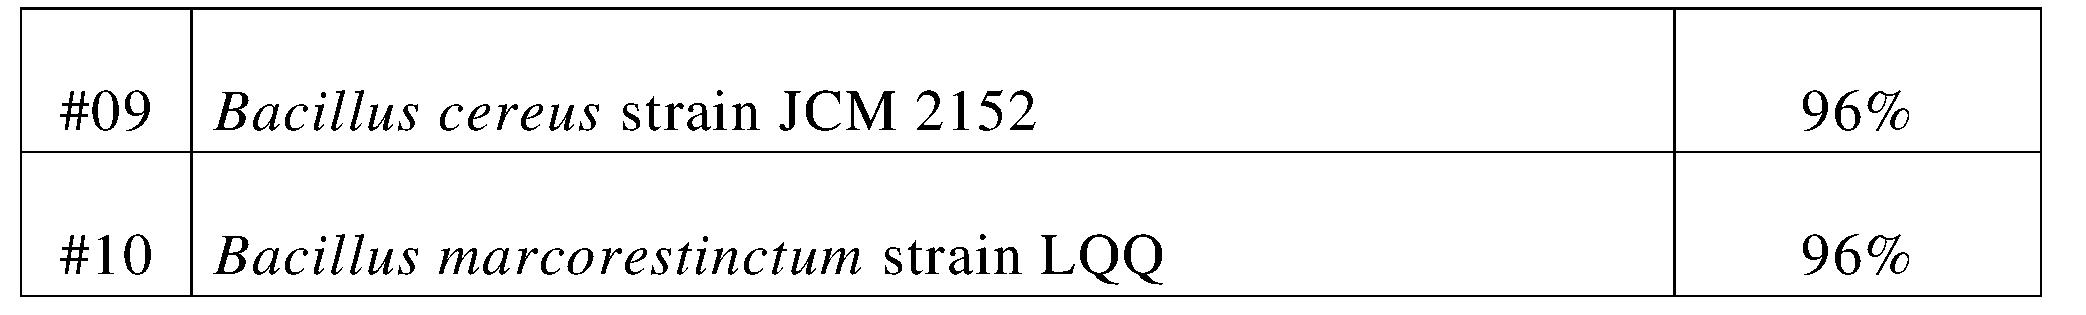 Figure 107145475-A0305-02-0008-7